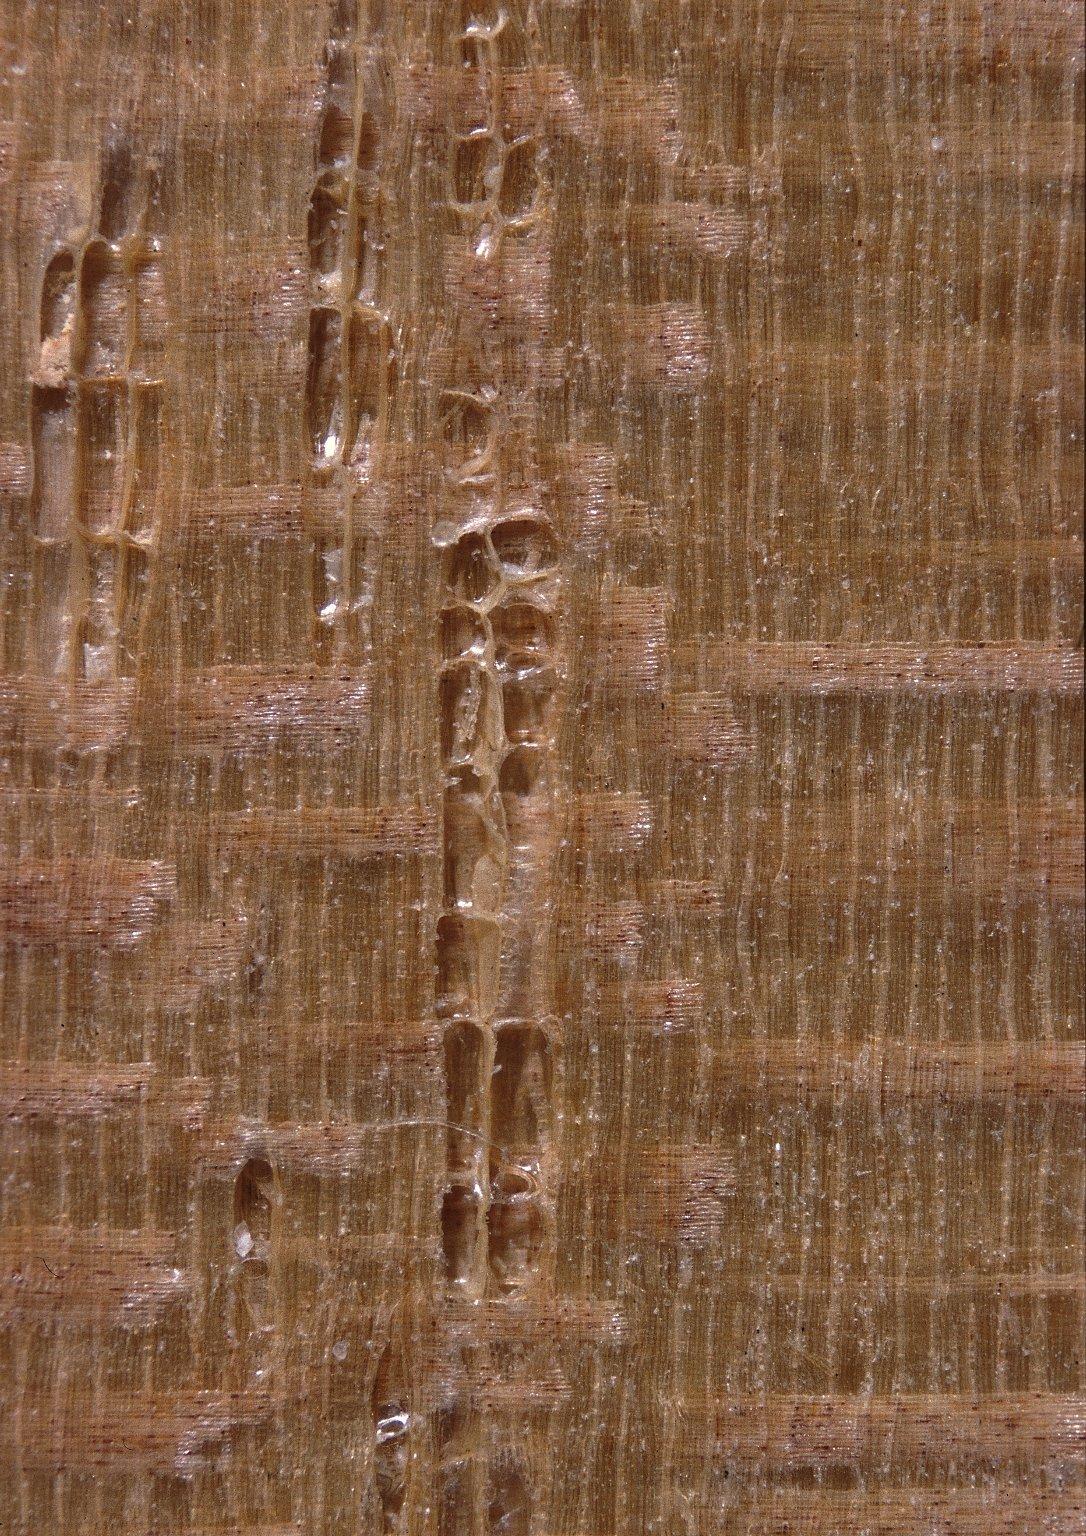 APOCYNACEAE Couma guianensis